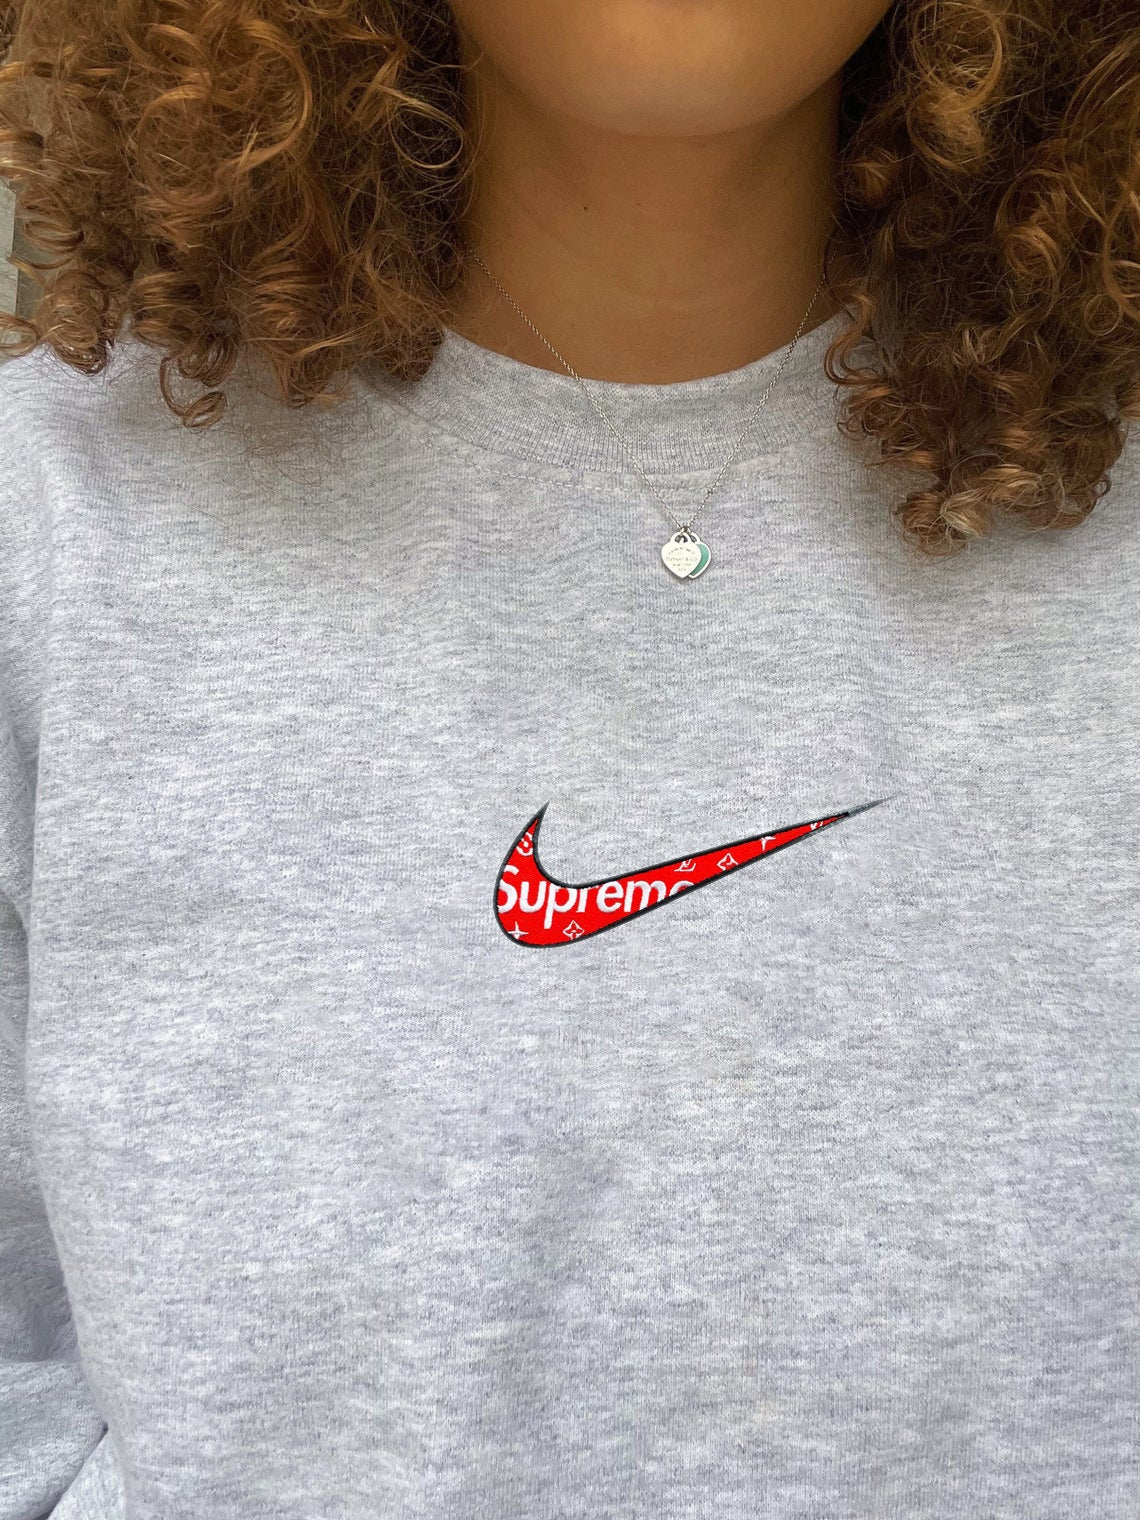 Nike Supreme Embroidered Swoosh Sweatshirt/t-shirt/hoodie Embroidery